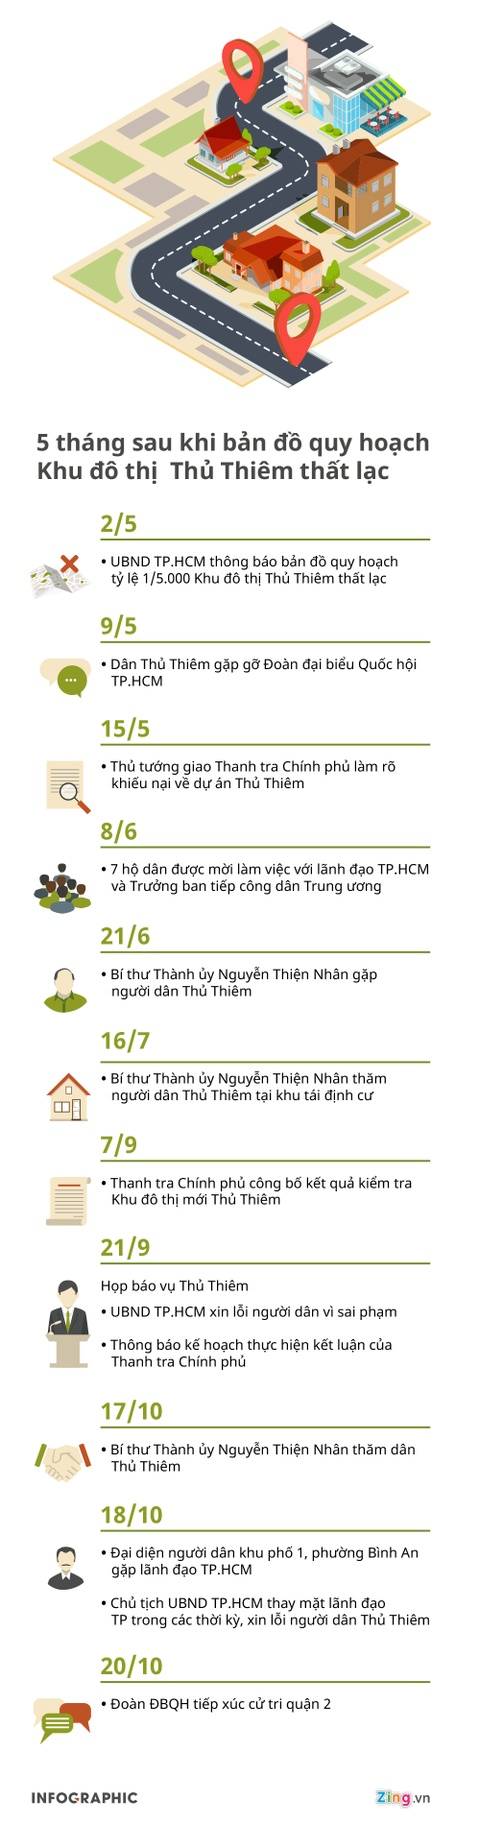 Nguoi dan Thu Thiem trao nuoc mat tai cuoc gap Bi thu Nhan hinh anh 16